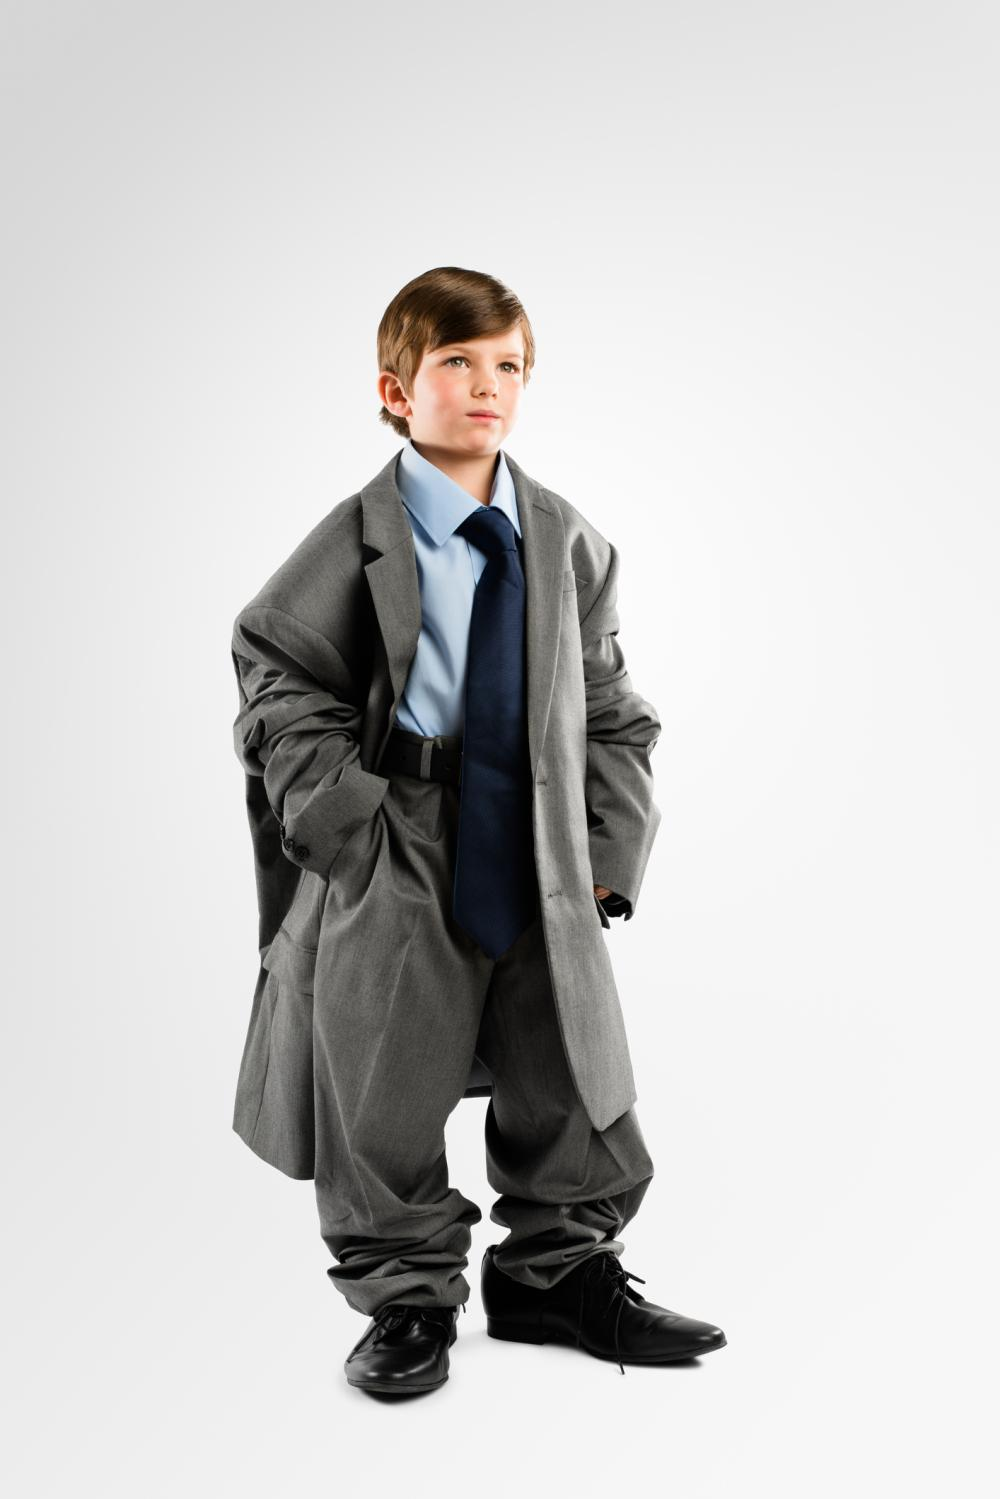 Funny diy halloween costume ideas for boys grownups